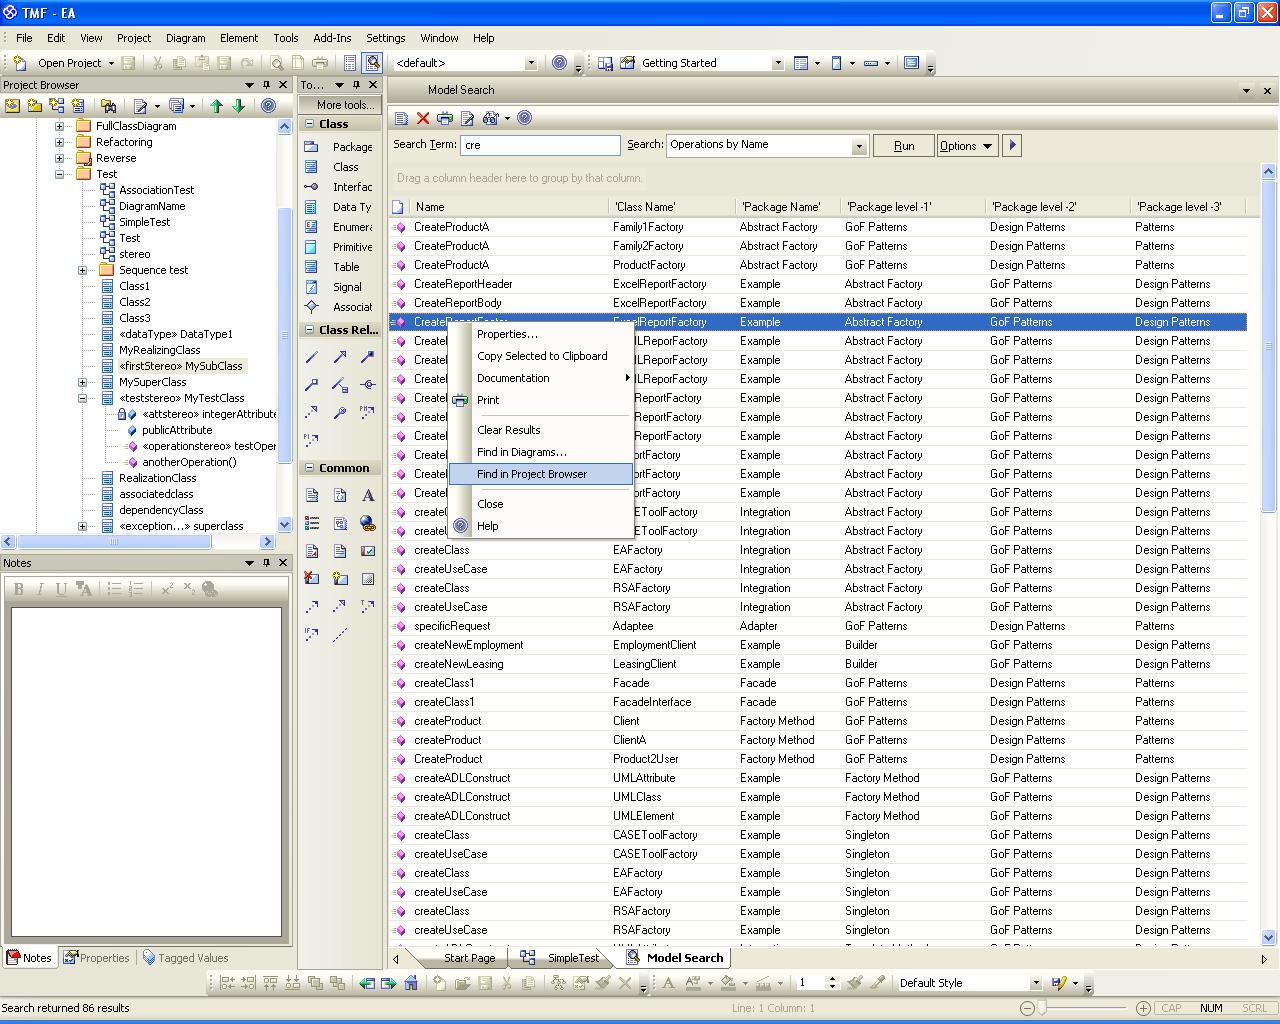 Harvesting the power of EA's SQL searches - Bellekens